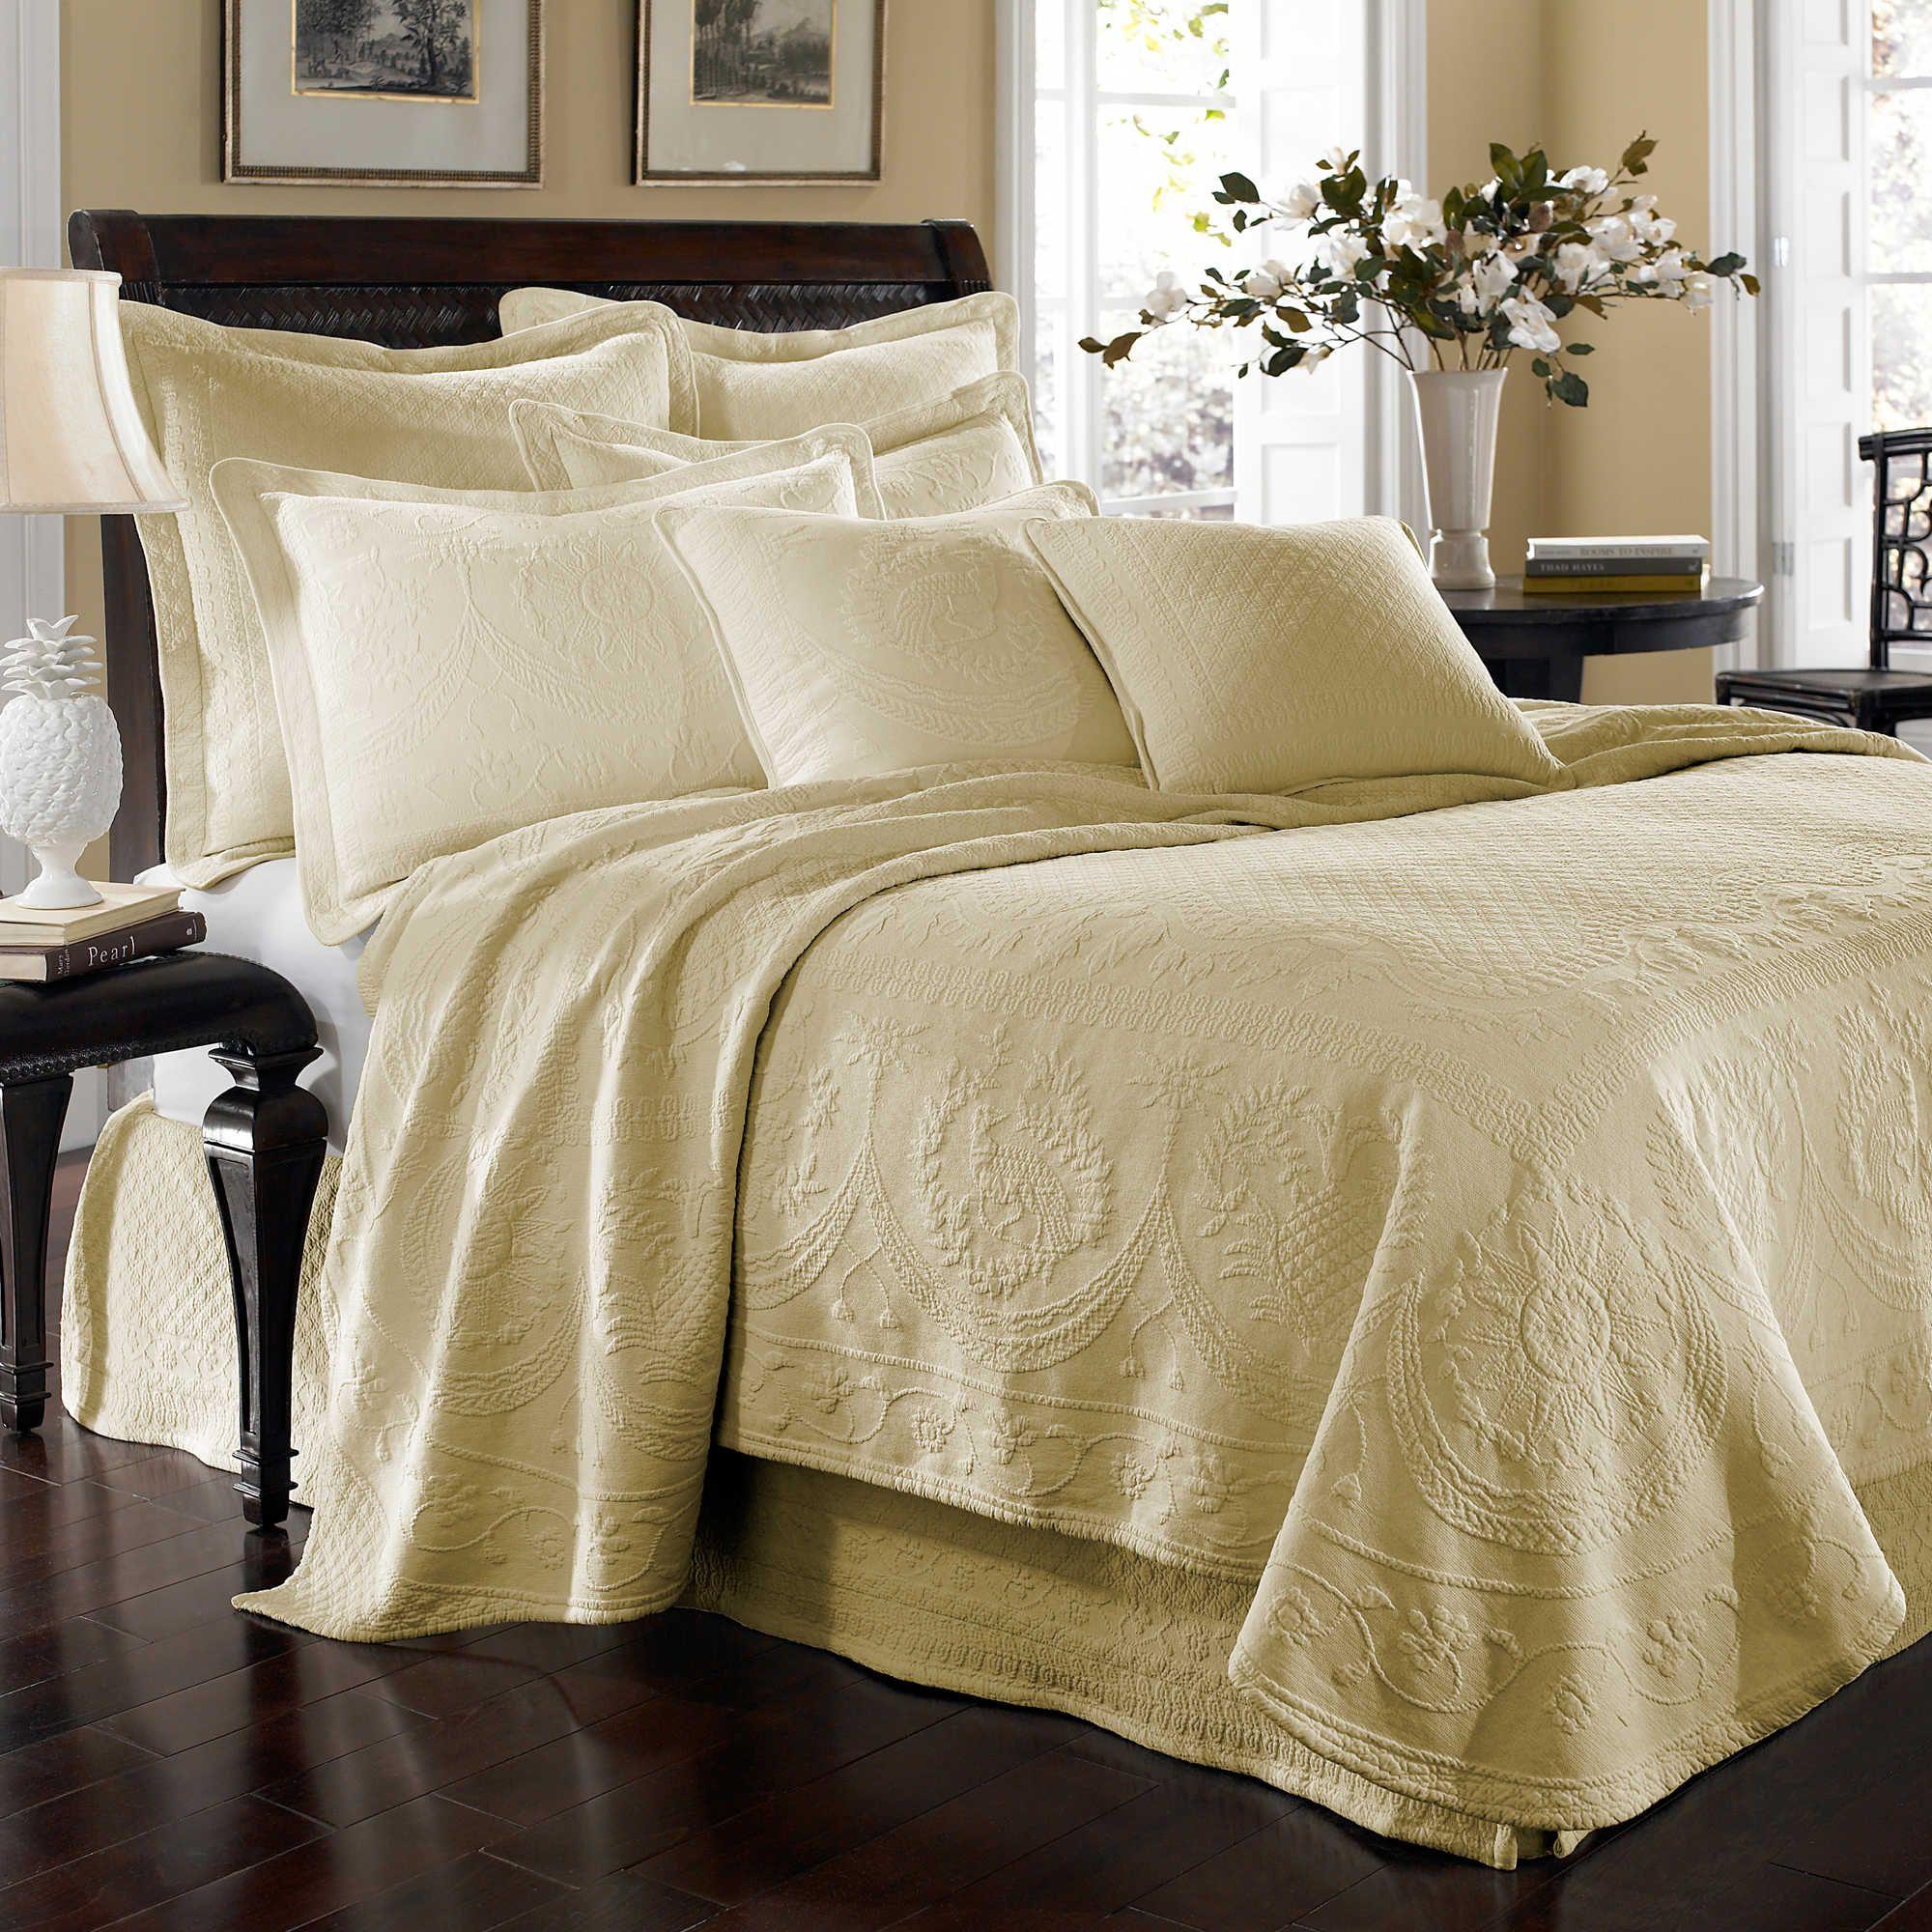 King Charles Matelasse Coverlet In Ivory Discount Bedroom